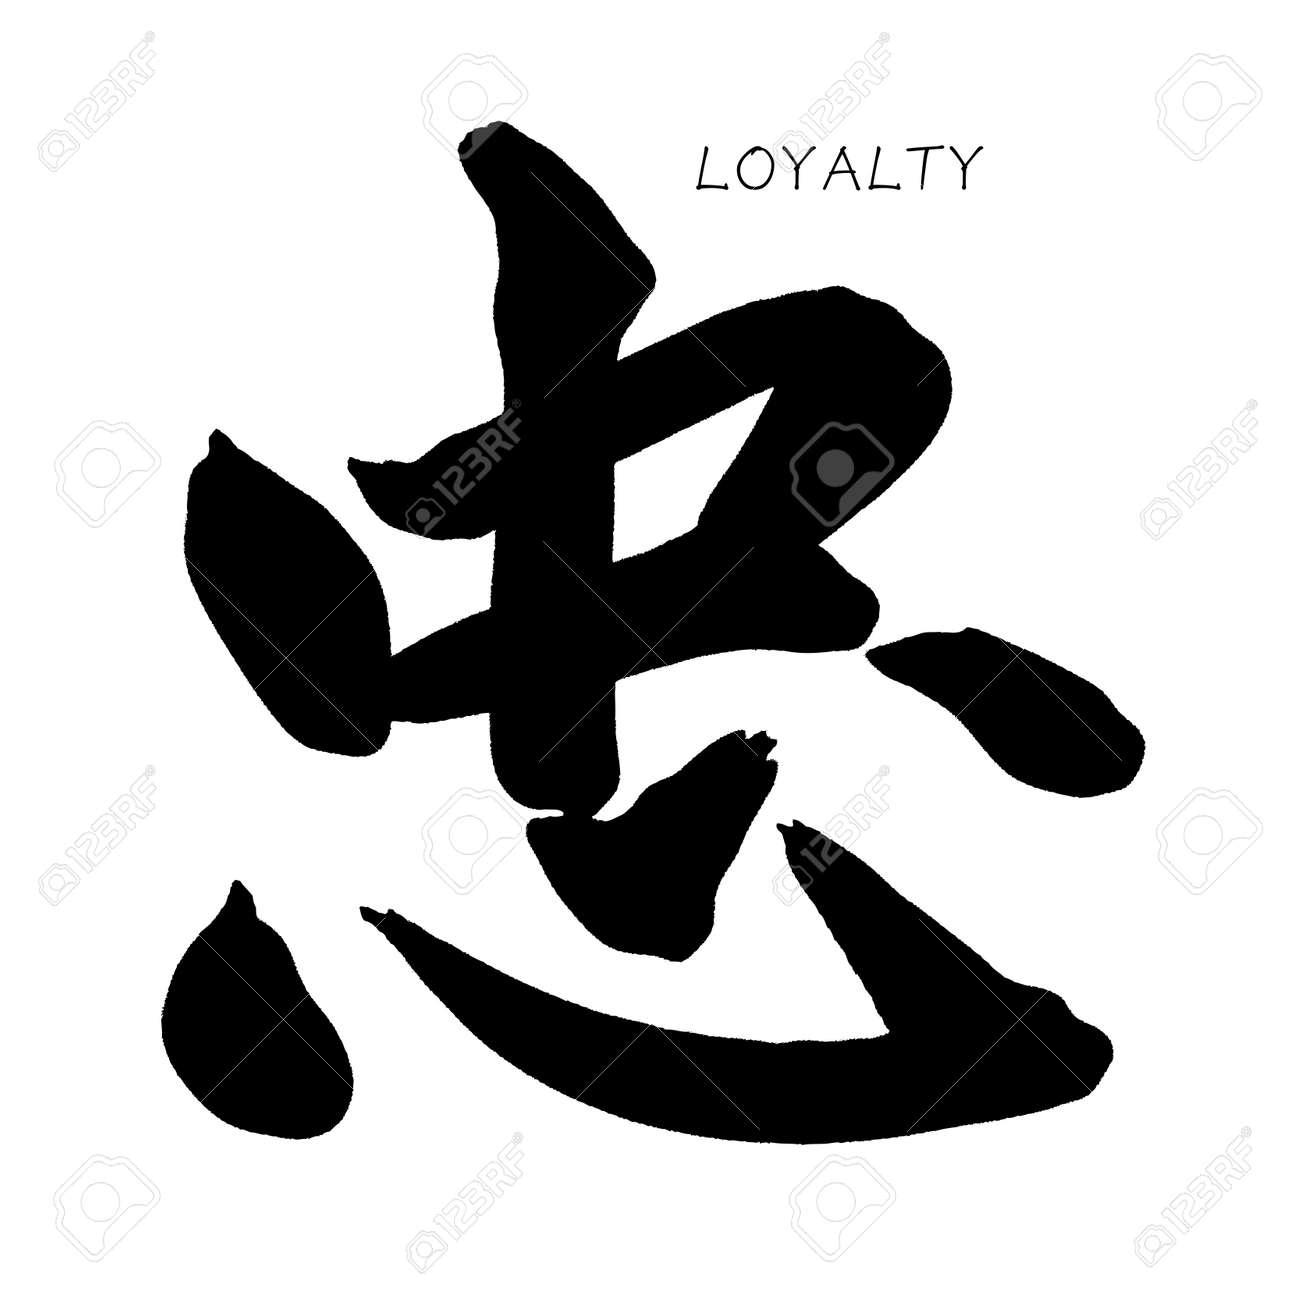 Chinese calligraphy zhong loyal loyalty devoted royalty chinese calligraphy zhong loyal loyalty devoted stock vector biocorpaavc